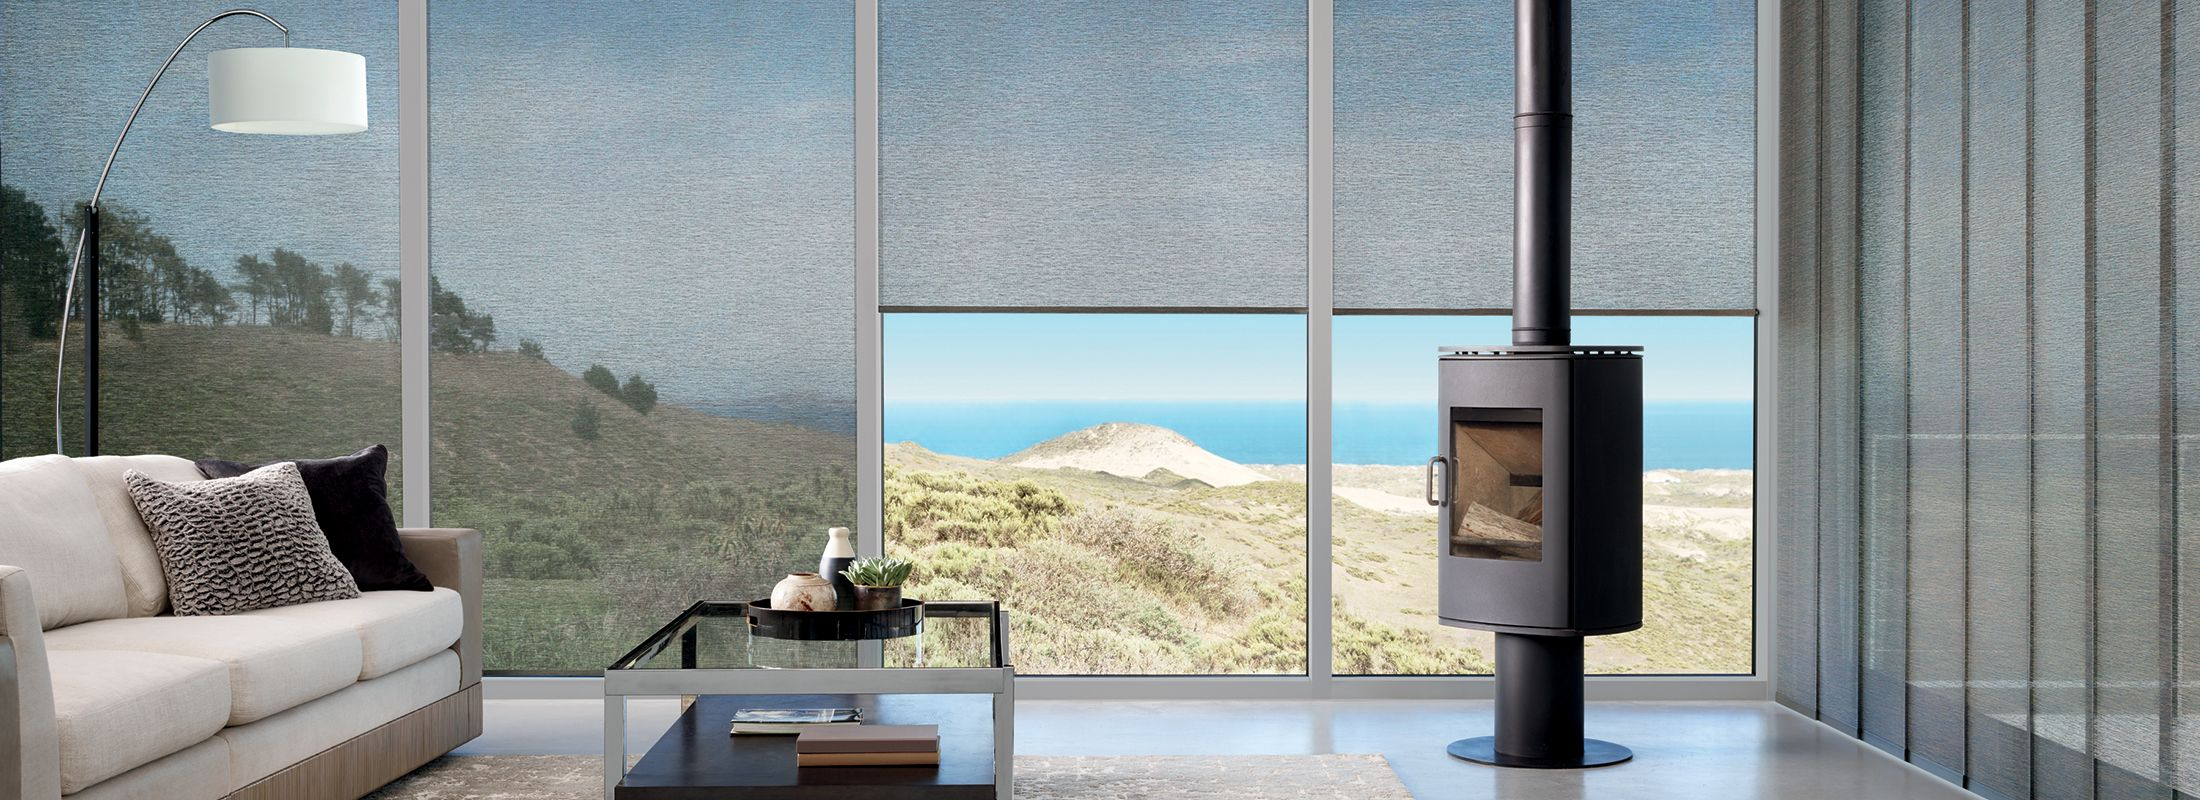 Light filtering fabrics in Zola Vayle - Alustra Woven Textures